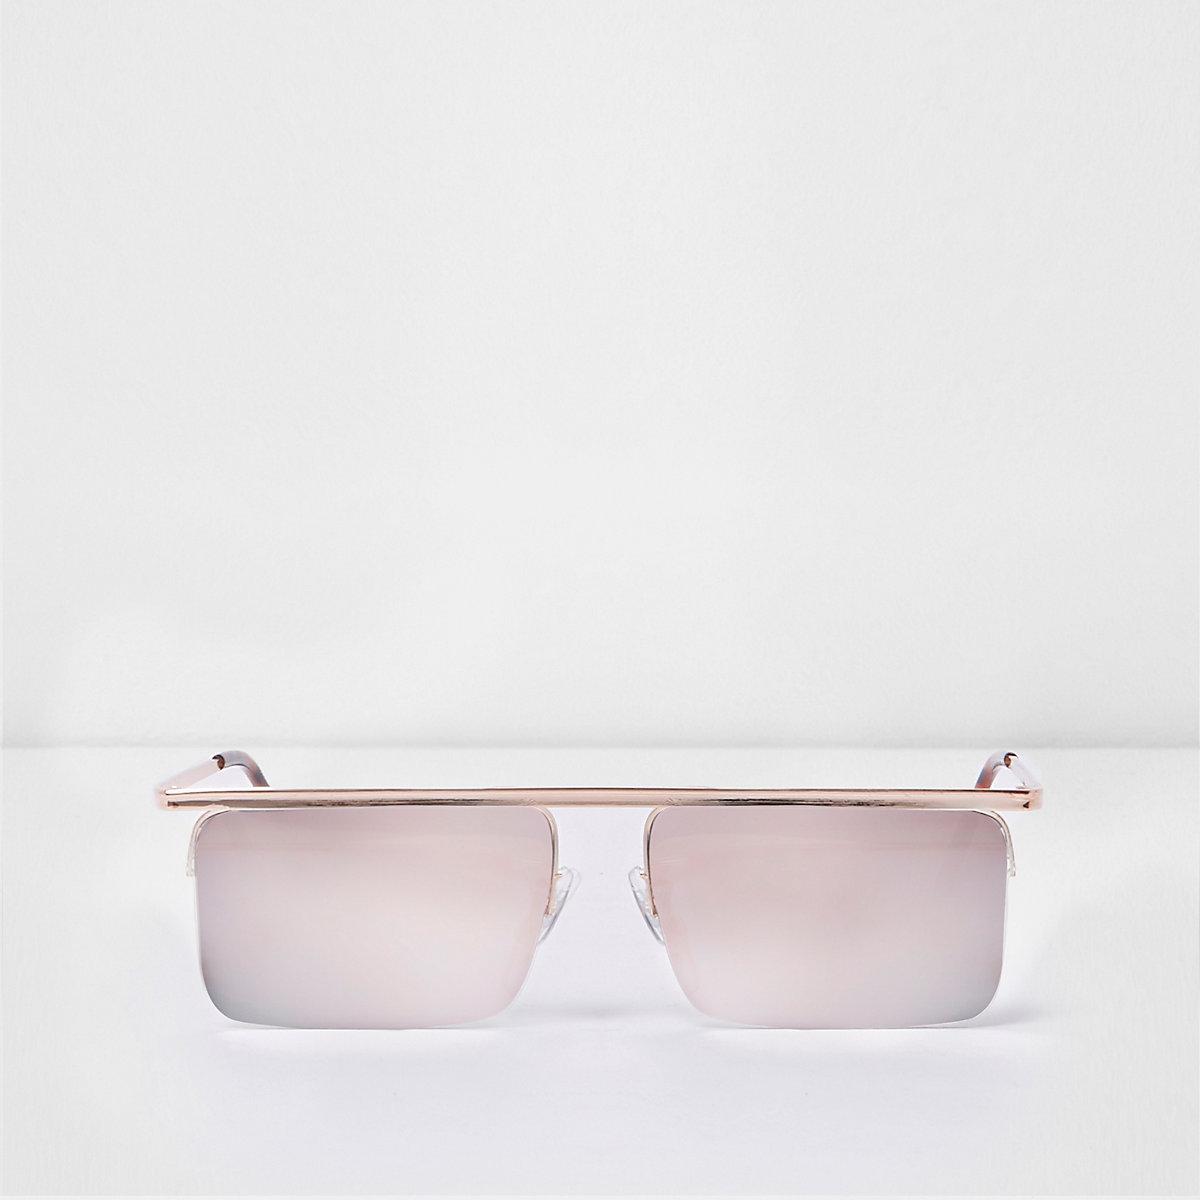 Gold tone mirror lens square visor sunglasses